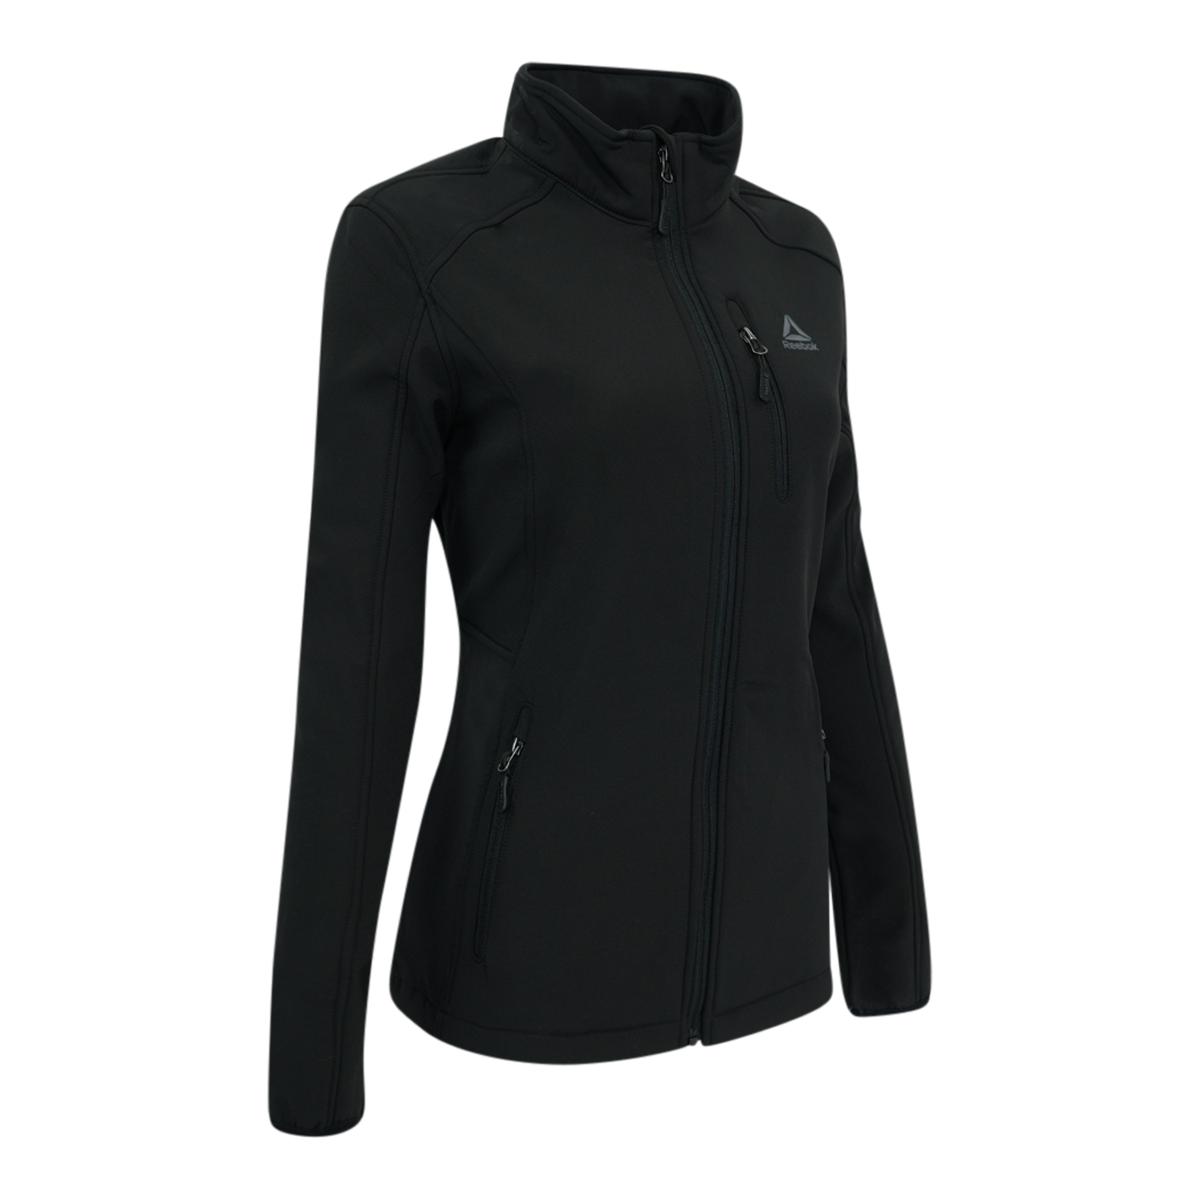 Reebok-Women-039-s-Full-Zip-Softshell-Jacket thumbnail 6